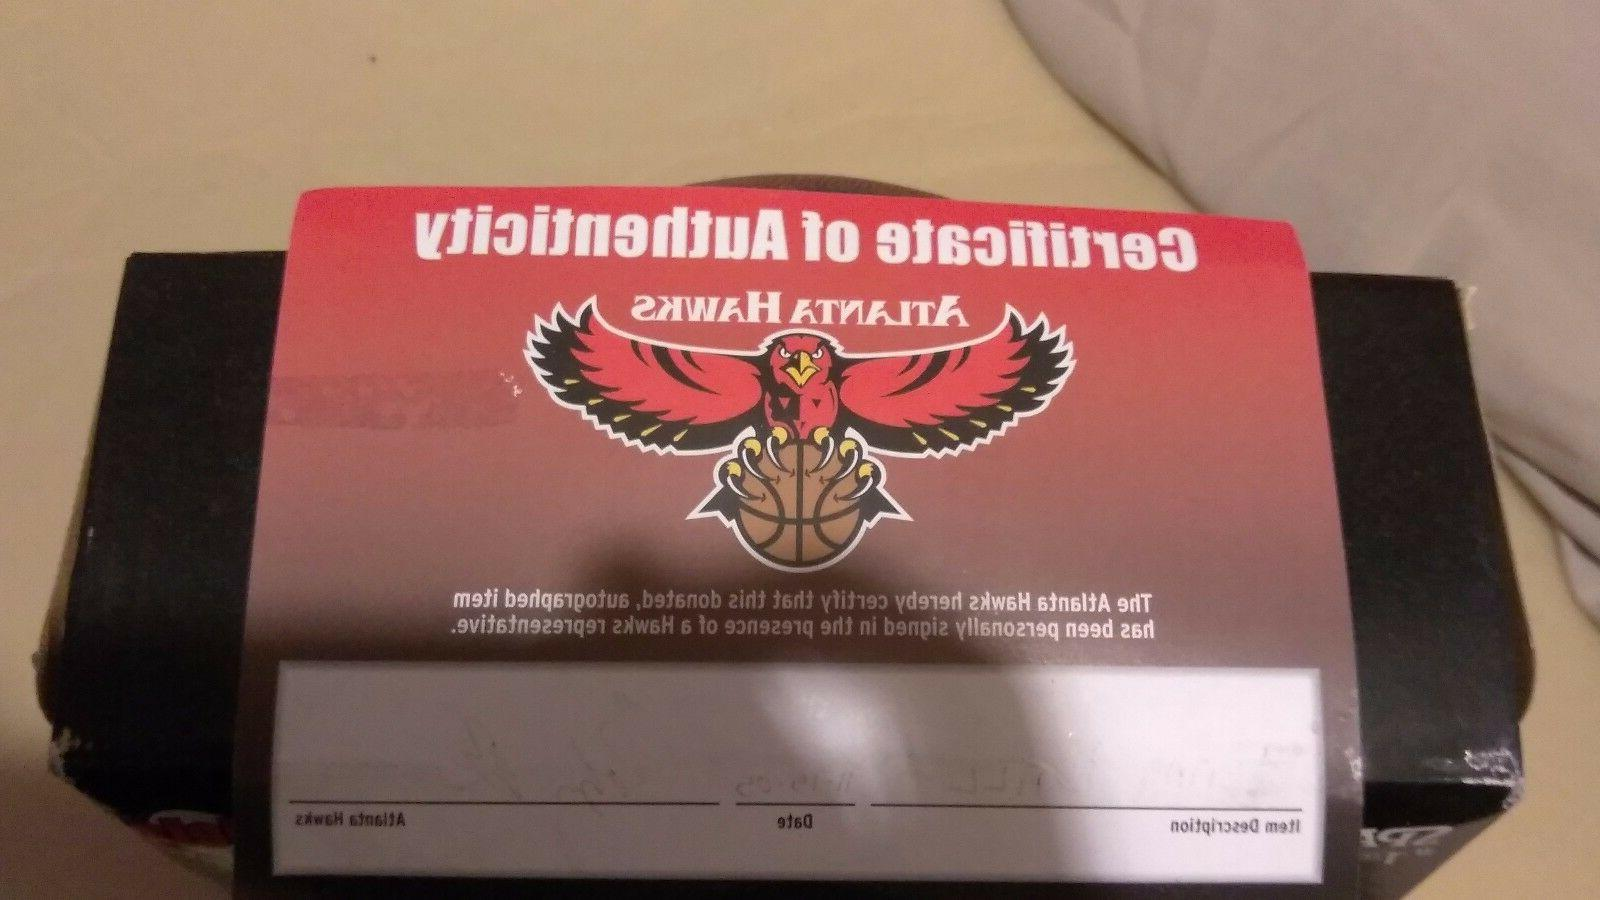 atlanta signed with